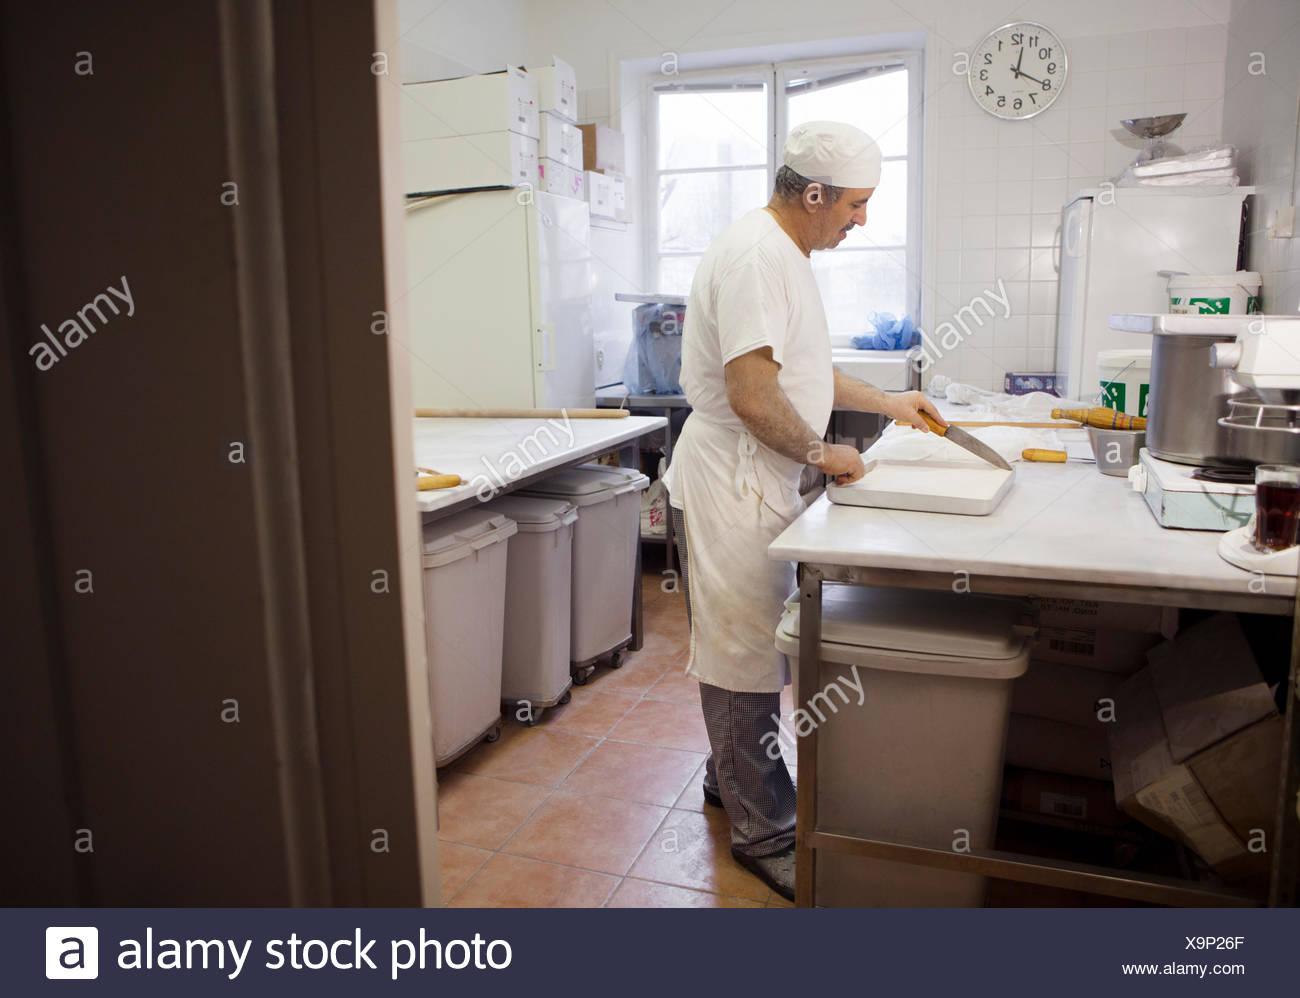 Chef baking baklava Photo Stock